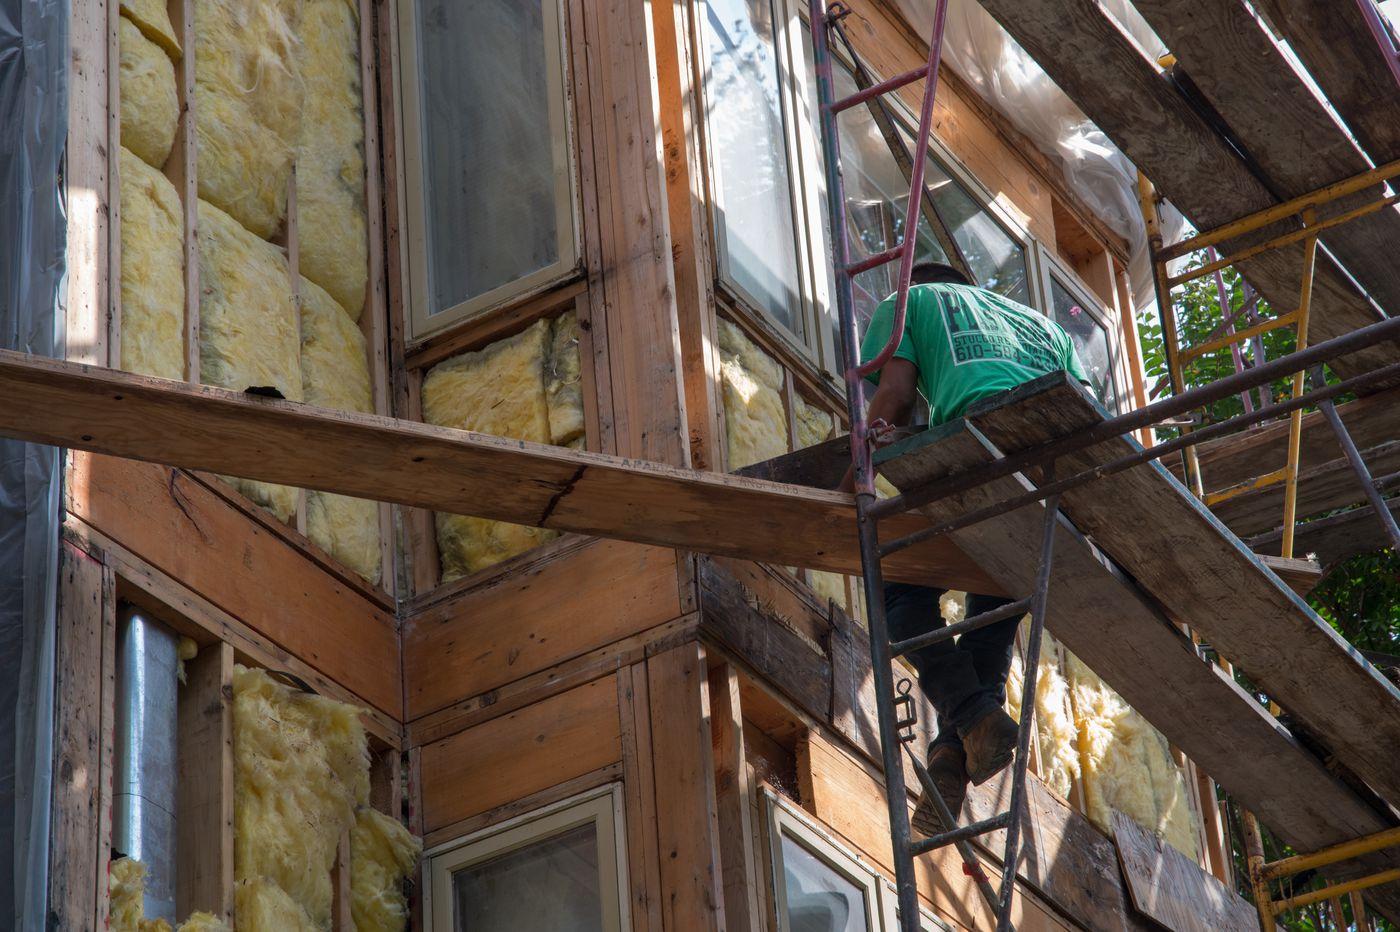 Rotting homes in Southeastern Pa., Johnny Bobbitt saga's latest twist | Morning Newsletter